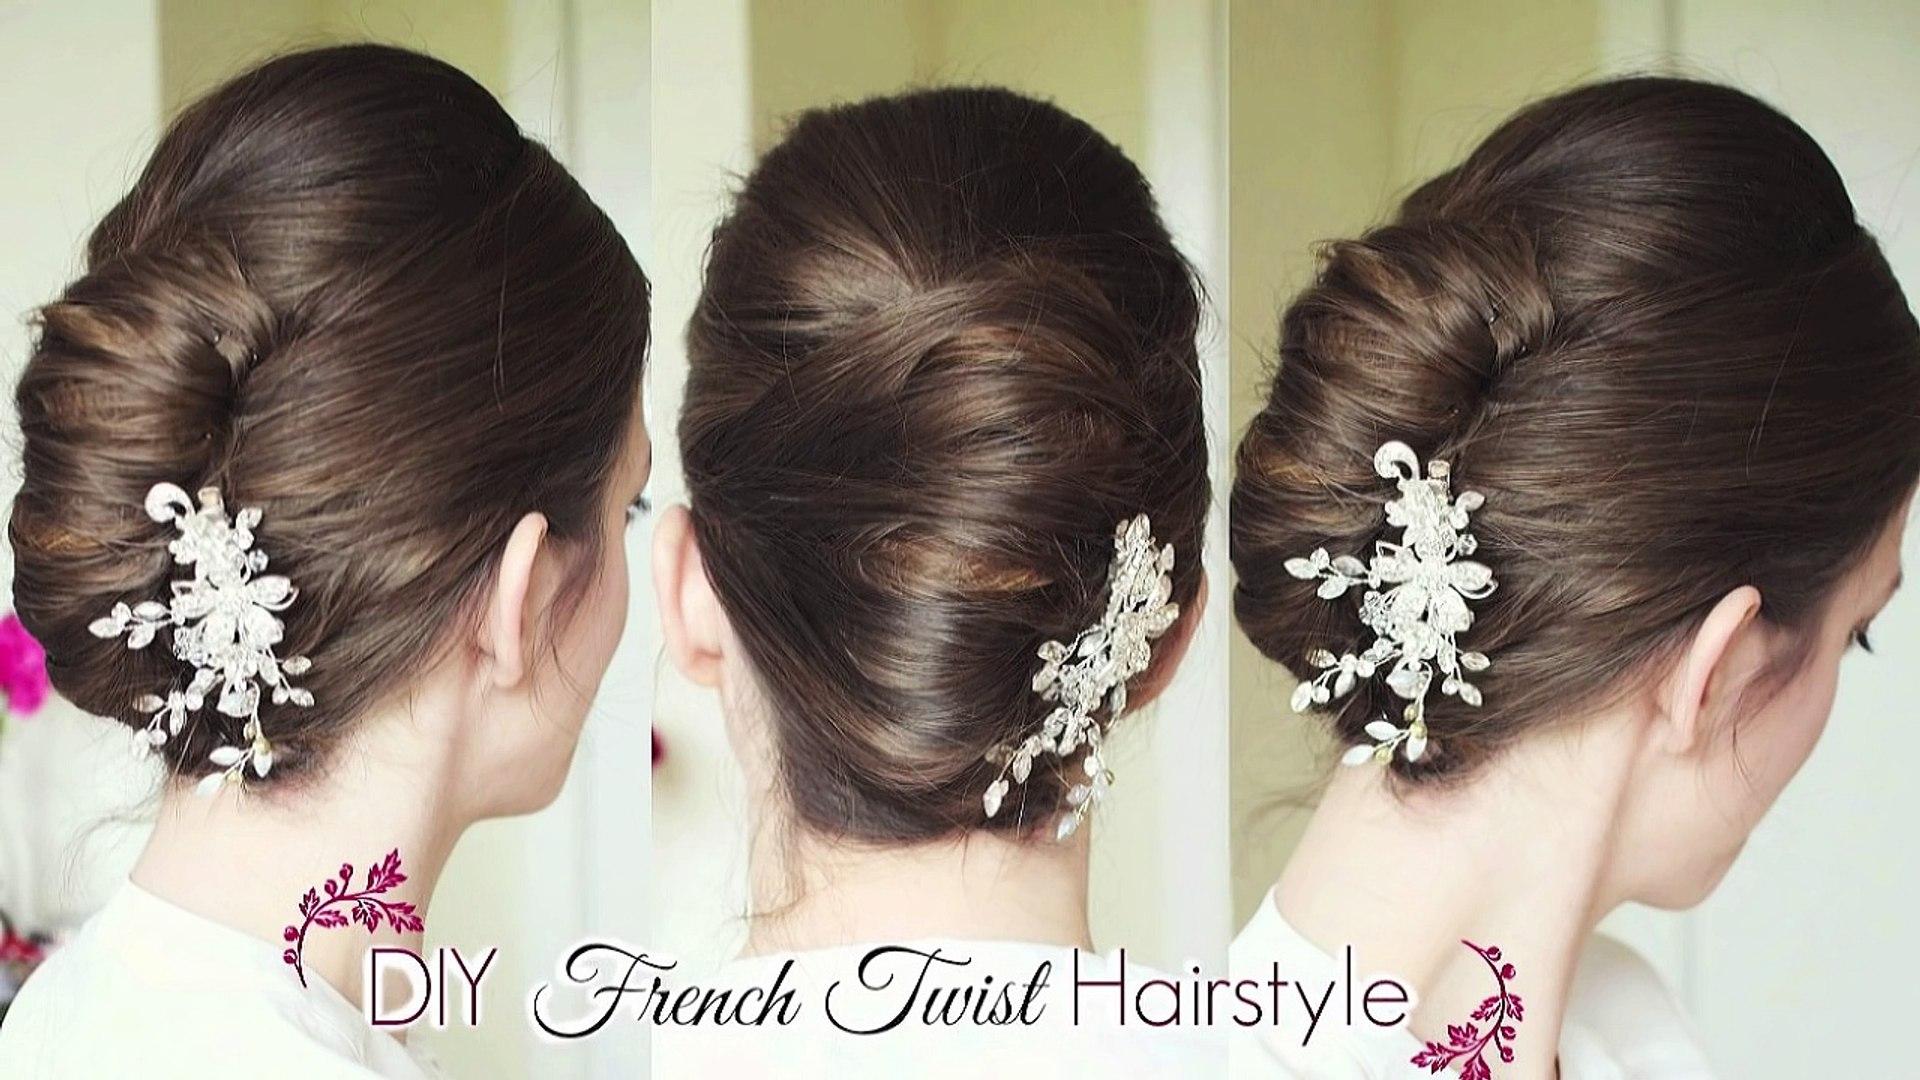 Superb Diy French Twist Updo Holiday Updo Hairstyles Schematic Wiring Diagrams Phreekkolirunnerswayorg